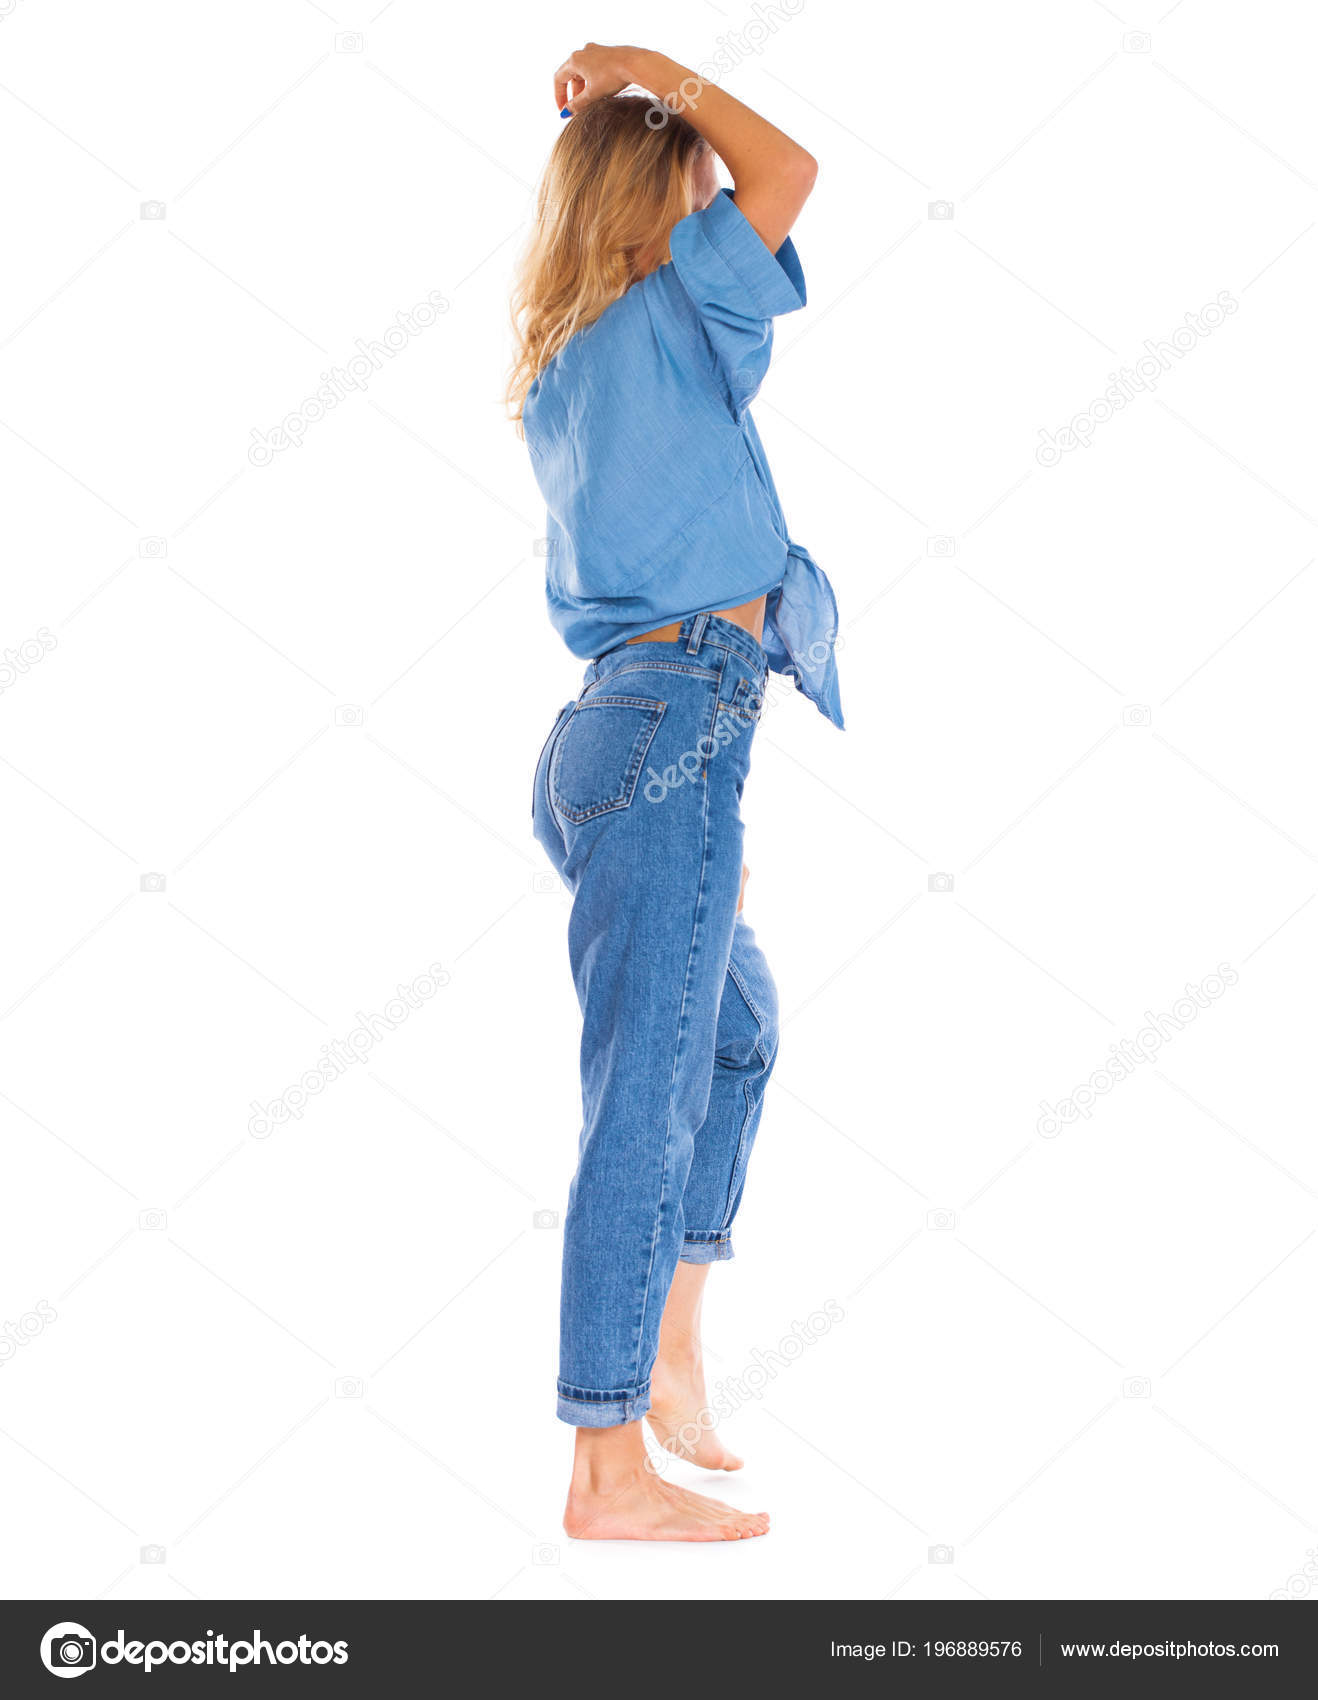 edd666d88202 ΠΙΣΩ ΟΨΗ τζιν μόδα. Ολόσωμο πορτρέτο νεαρός ξανθιά γυναίκα στο μπλε τζιν  στέκεται απομονωθεί σε λευκό φόντο — Εικόνα από ...